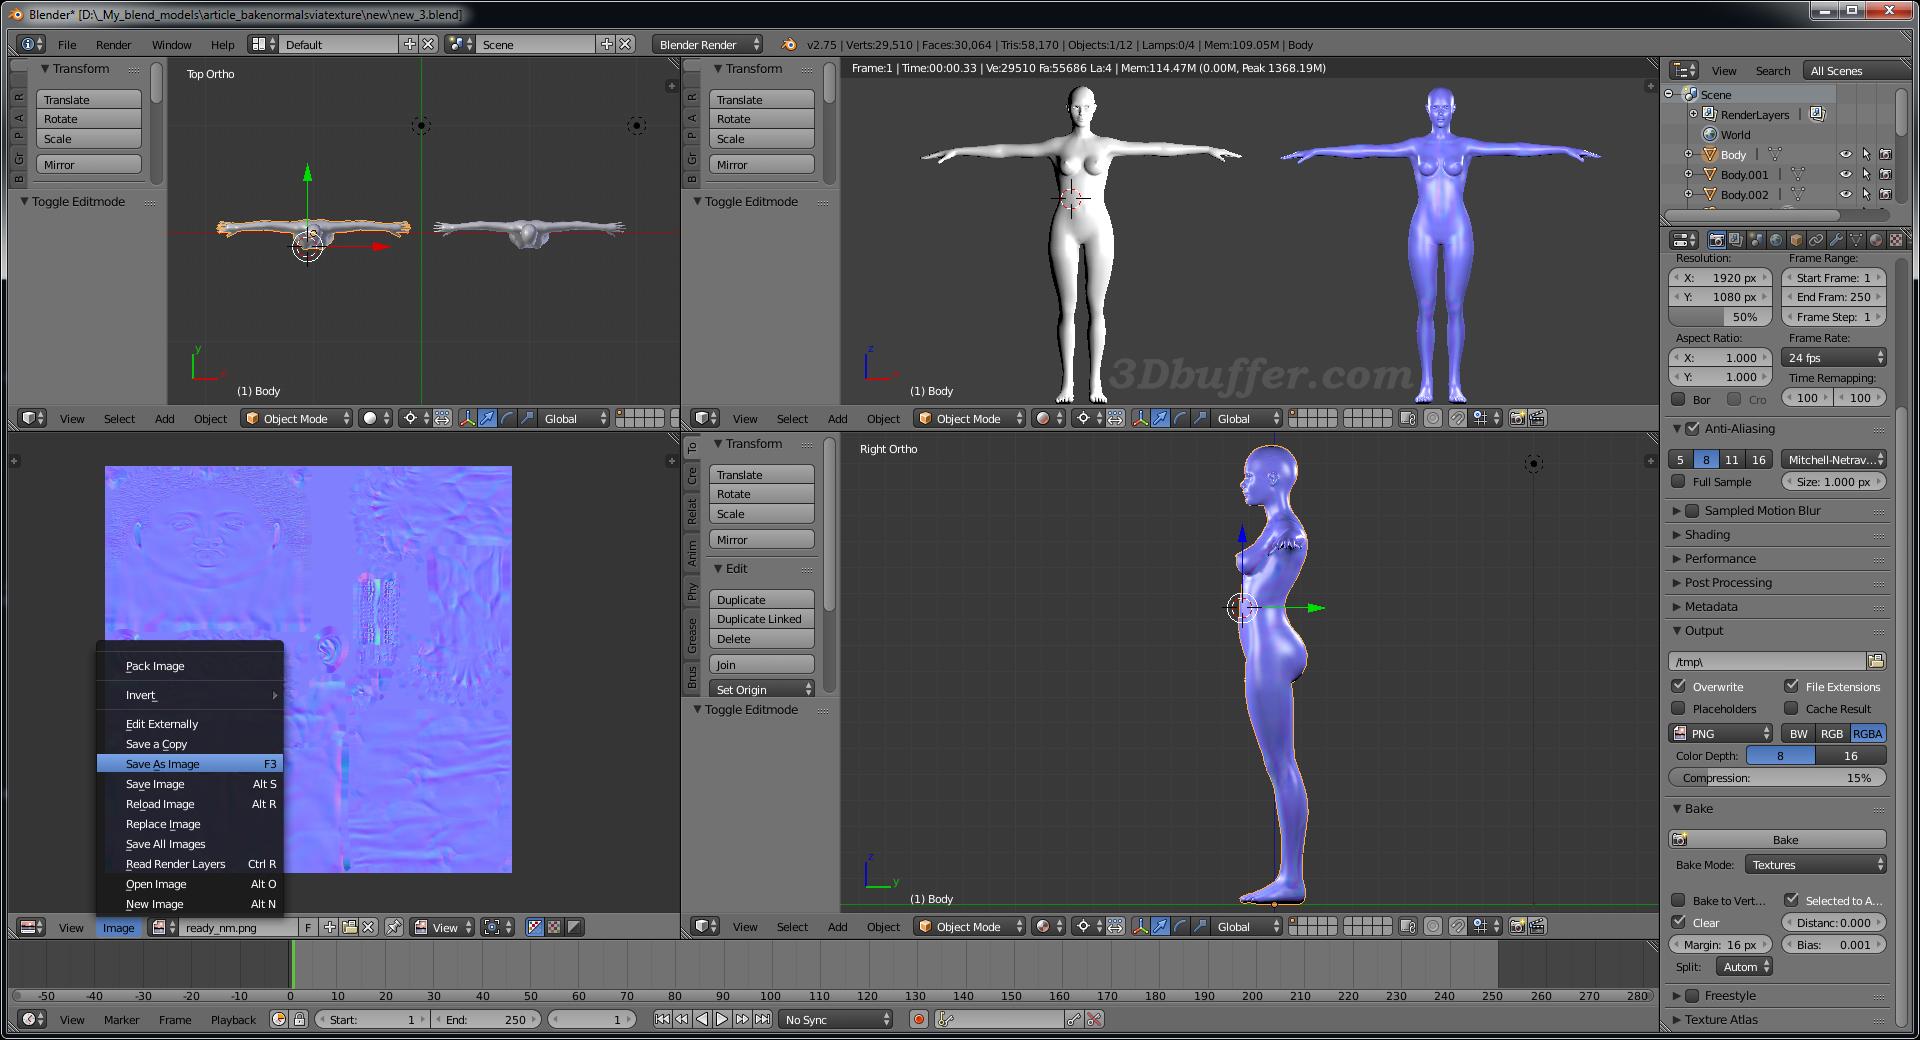 Blender Character Modeling Unity : D models unity blender characters fuse